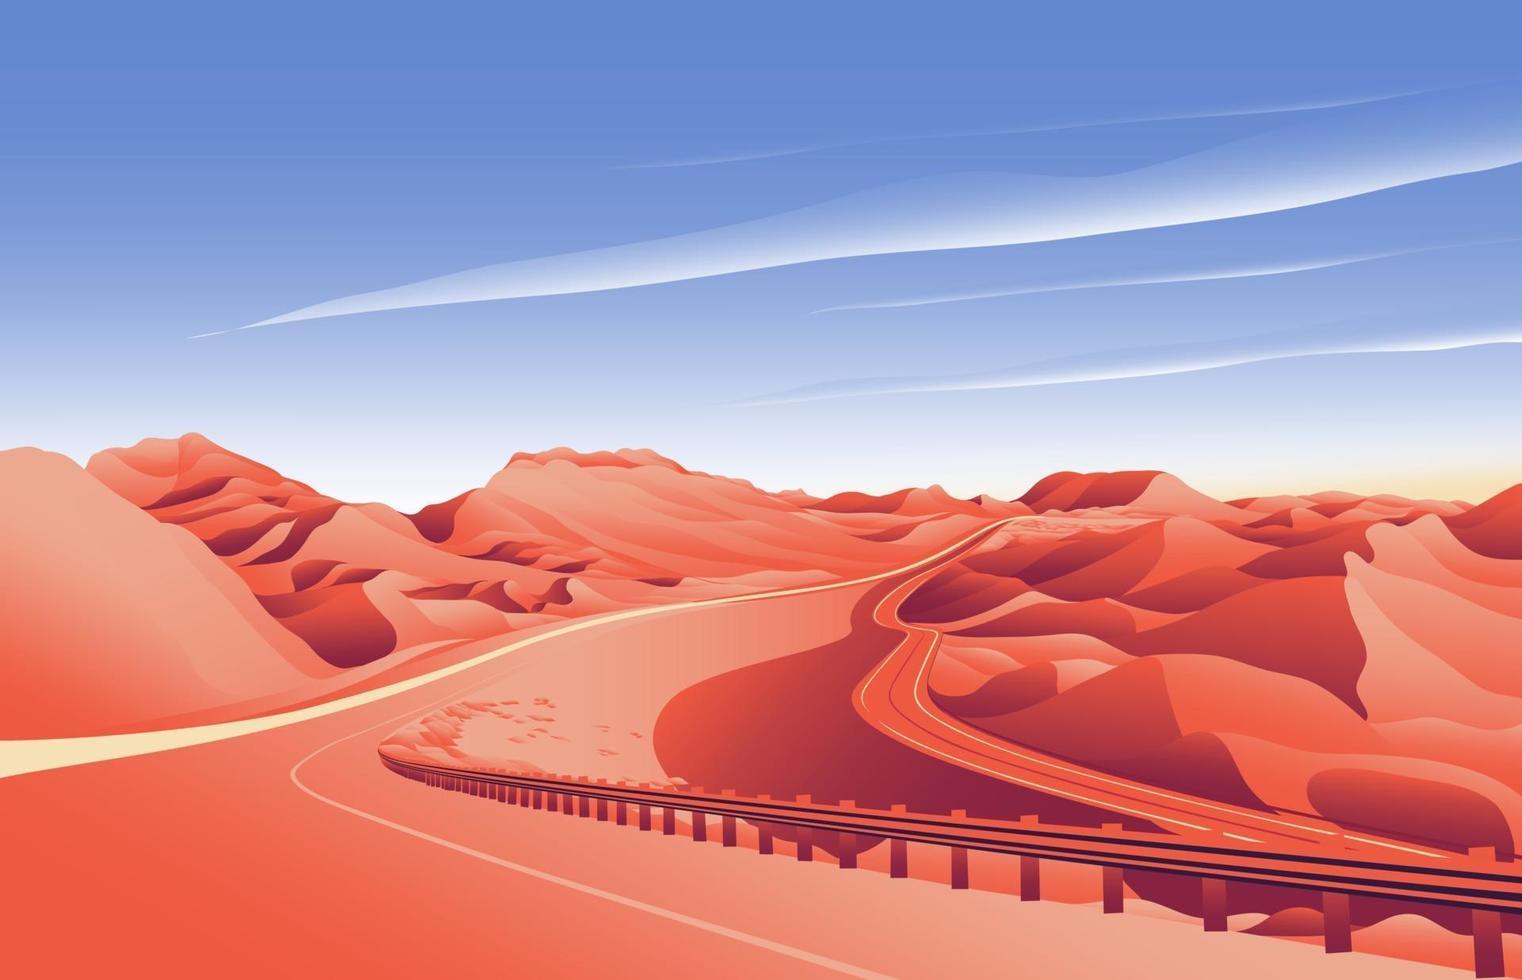 desert hill road landscape background vector